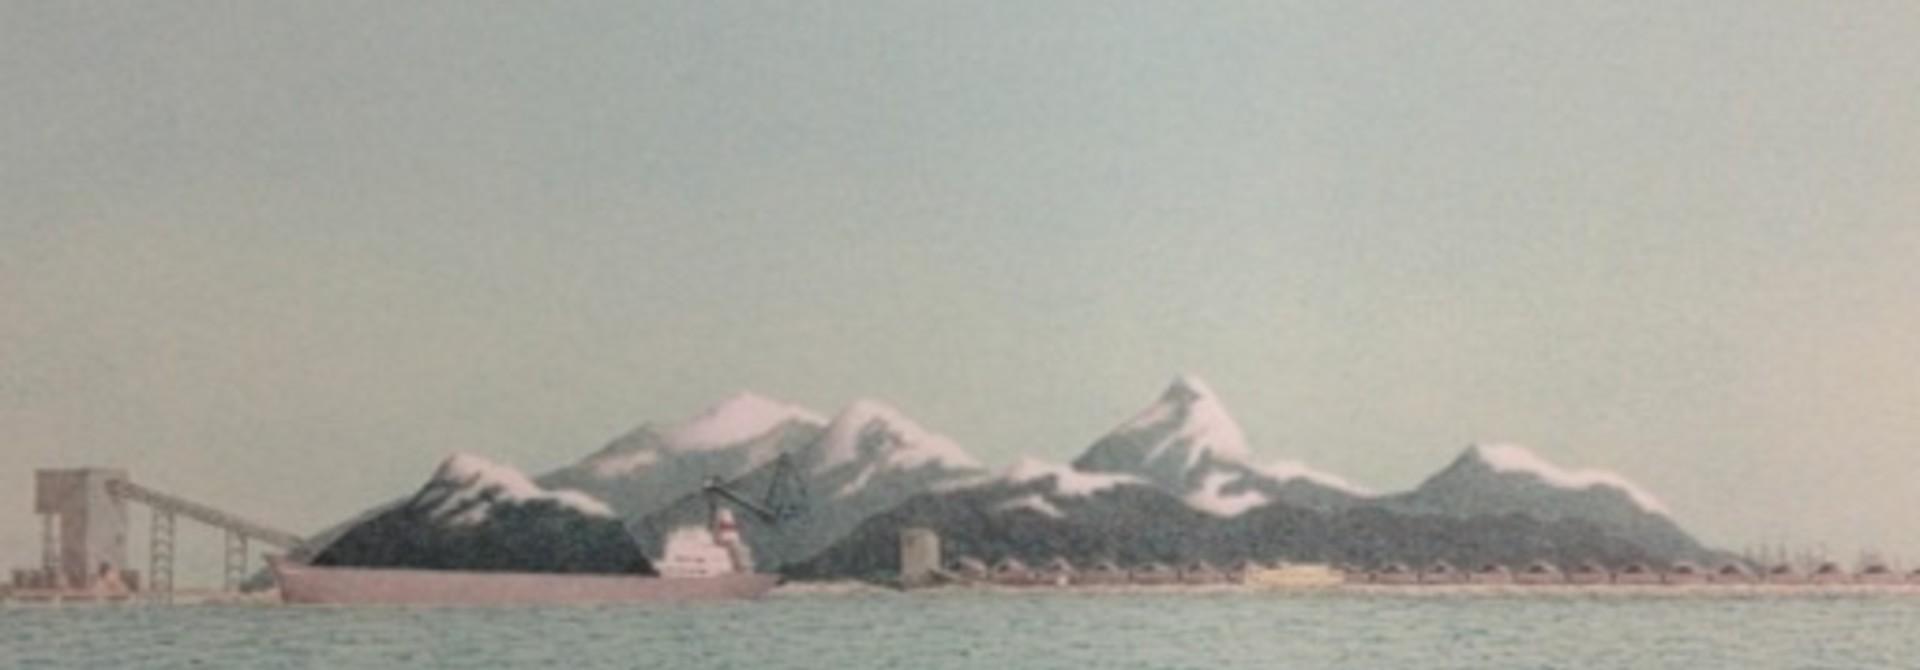 Roberts Bank Mountain Port